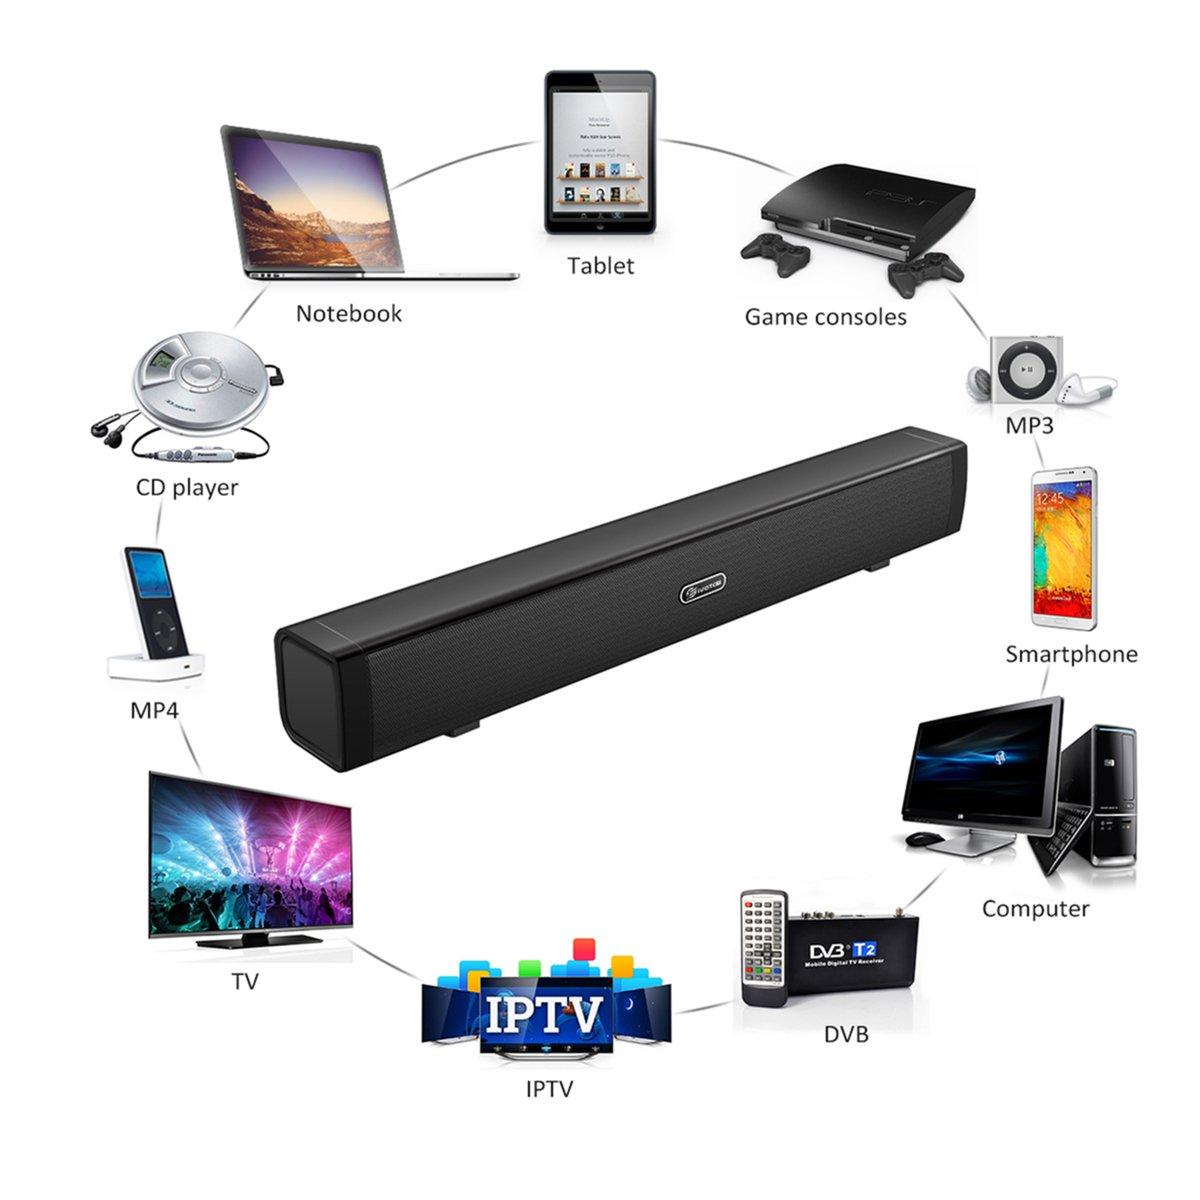 Barra de Sonido,EIVOTOR Barra Inalámbrica para PC Mini Altavoz Soundbar USB Portatil con Puerto AUX de 3,5 mm Estéreo Dual 3D (2x3W),Negro: Amazon.es: Electrónica